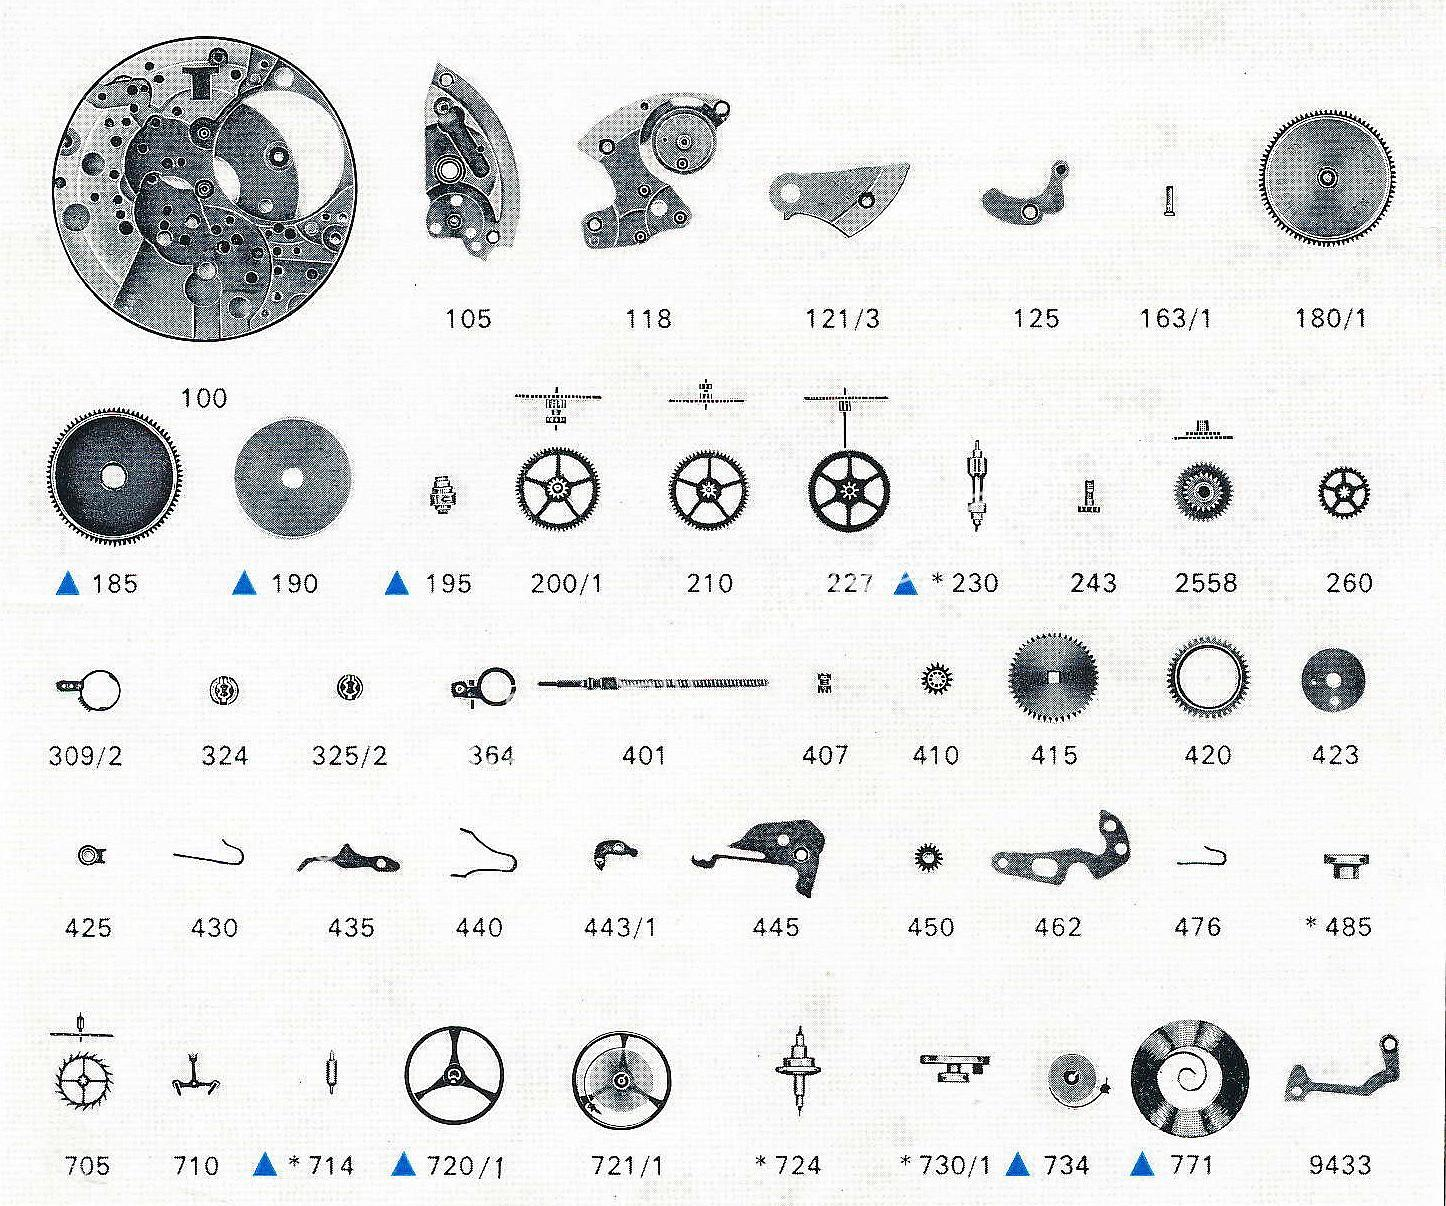 Favre leuba FL 1149 watch parts